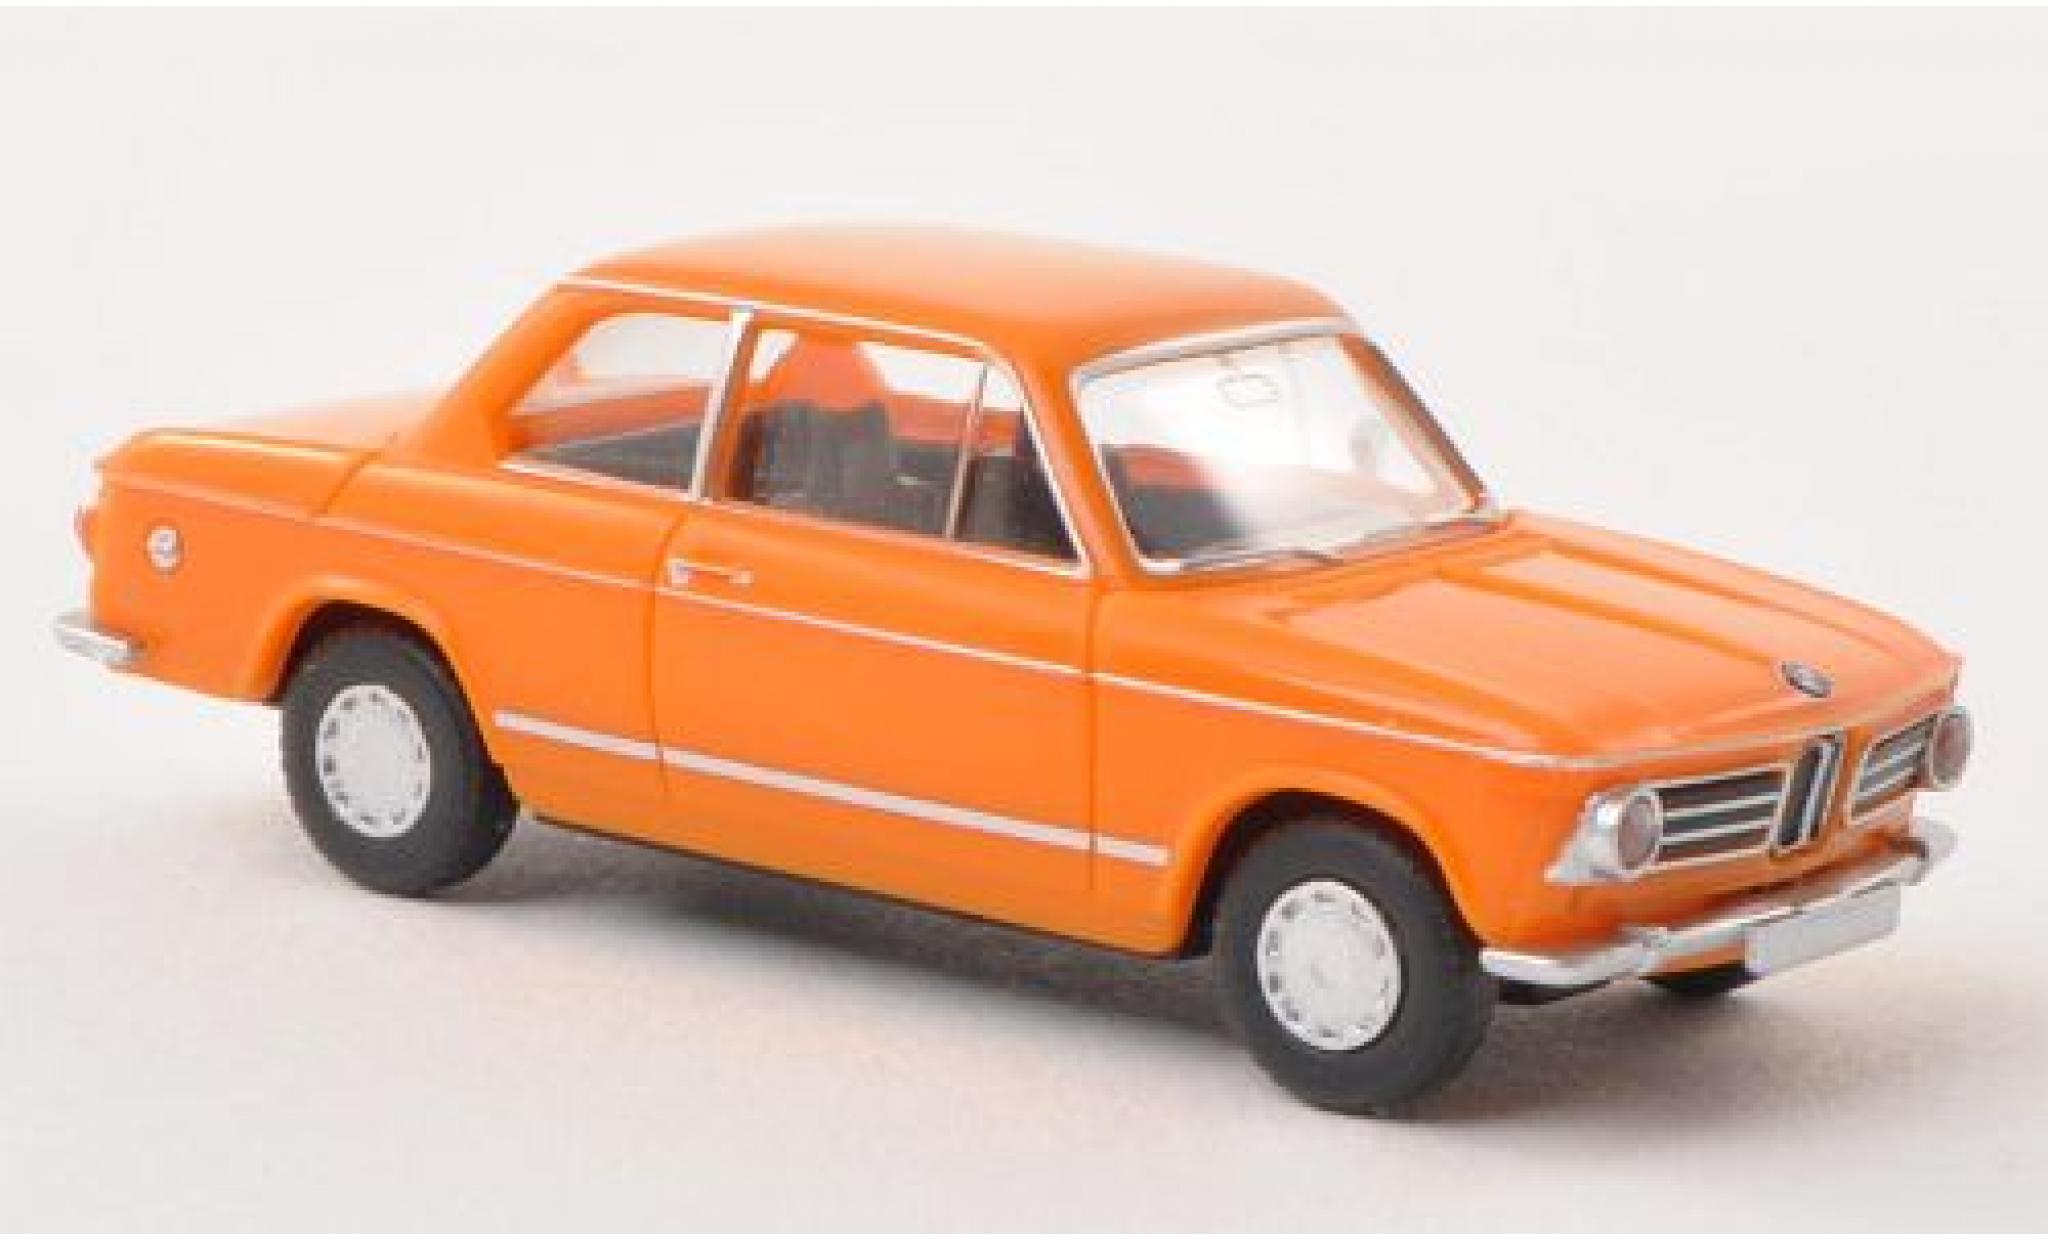 Bmw 2002 1/87 Wiking orange